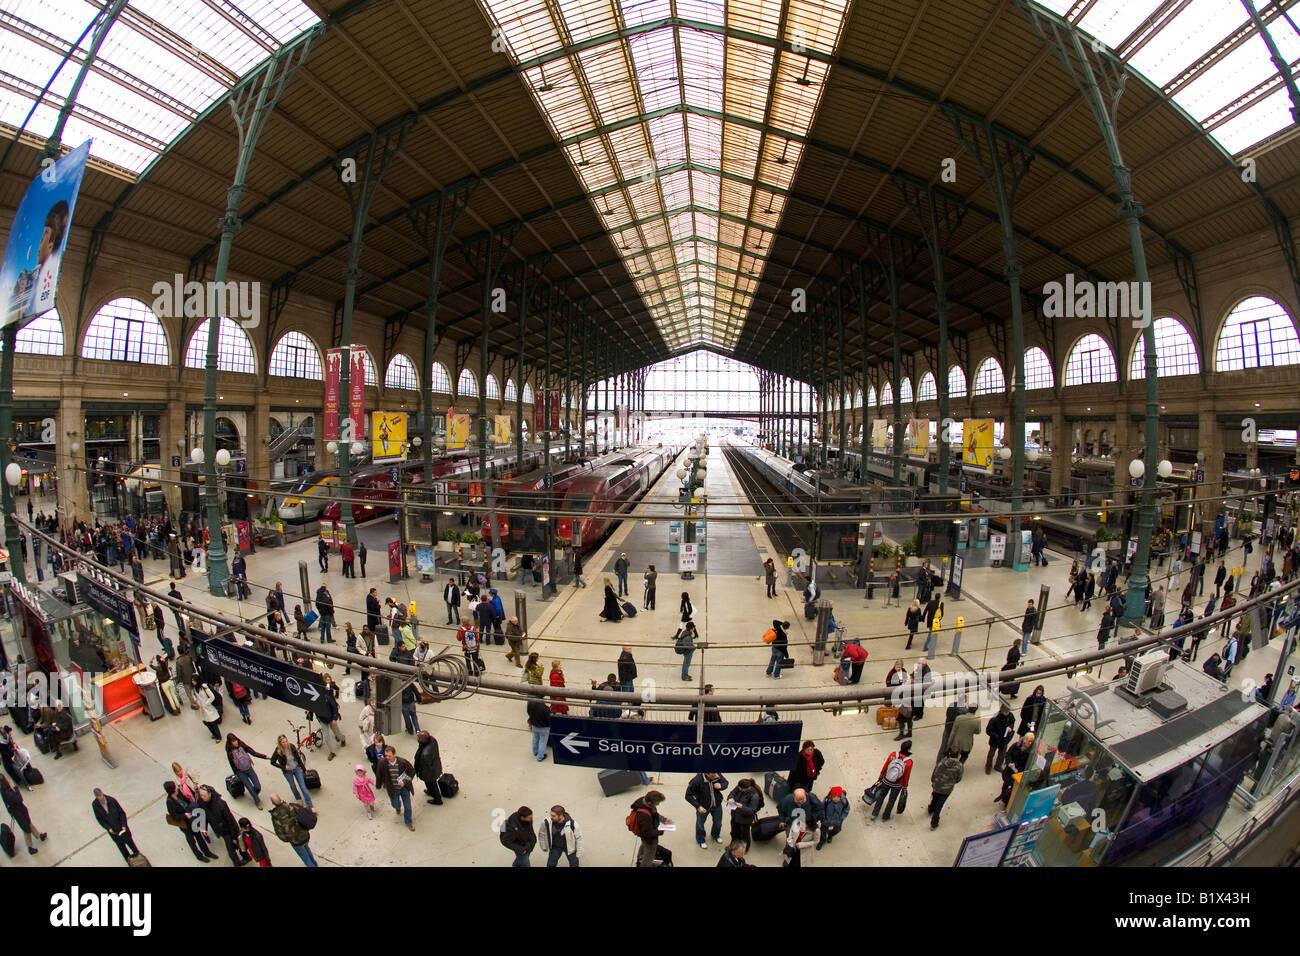 Trains, platforms, and passengers in Paris Gare du Nord France Europe EU - Stock Image